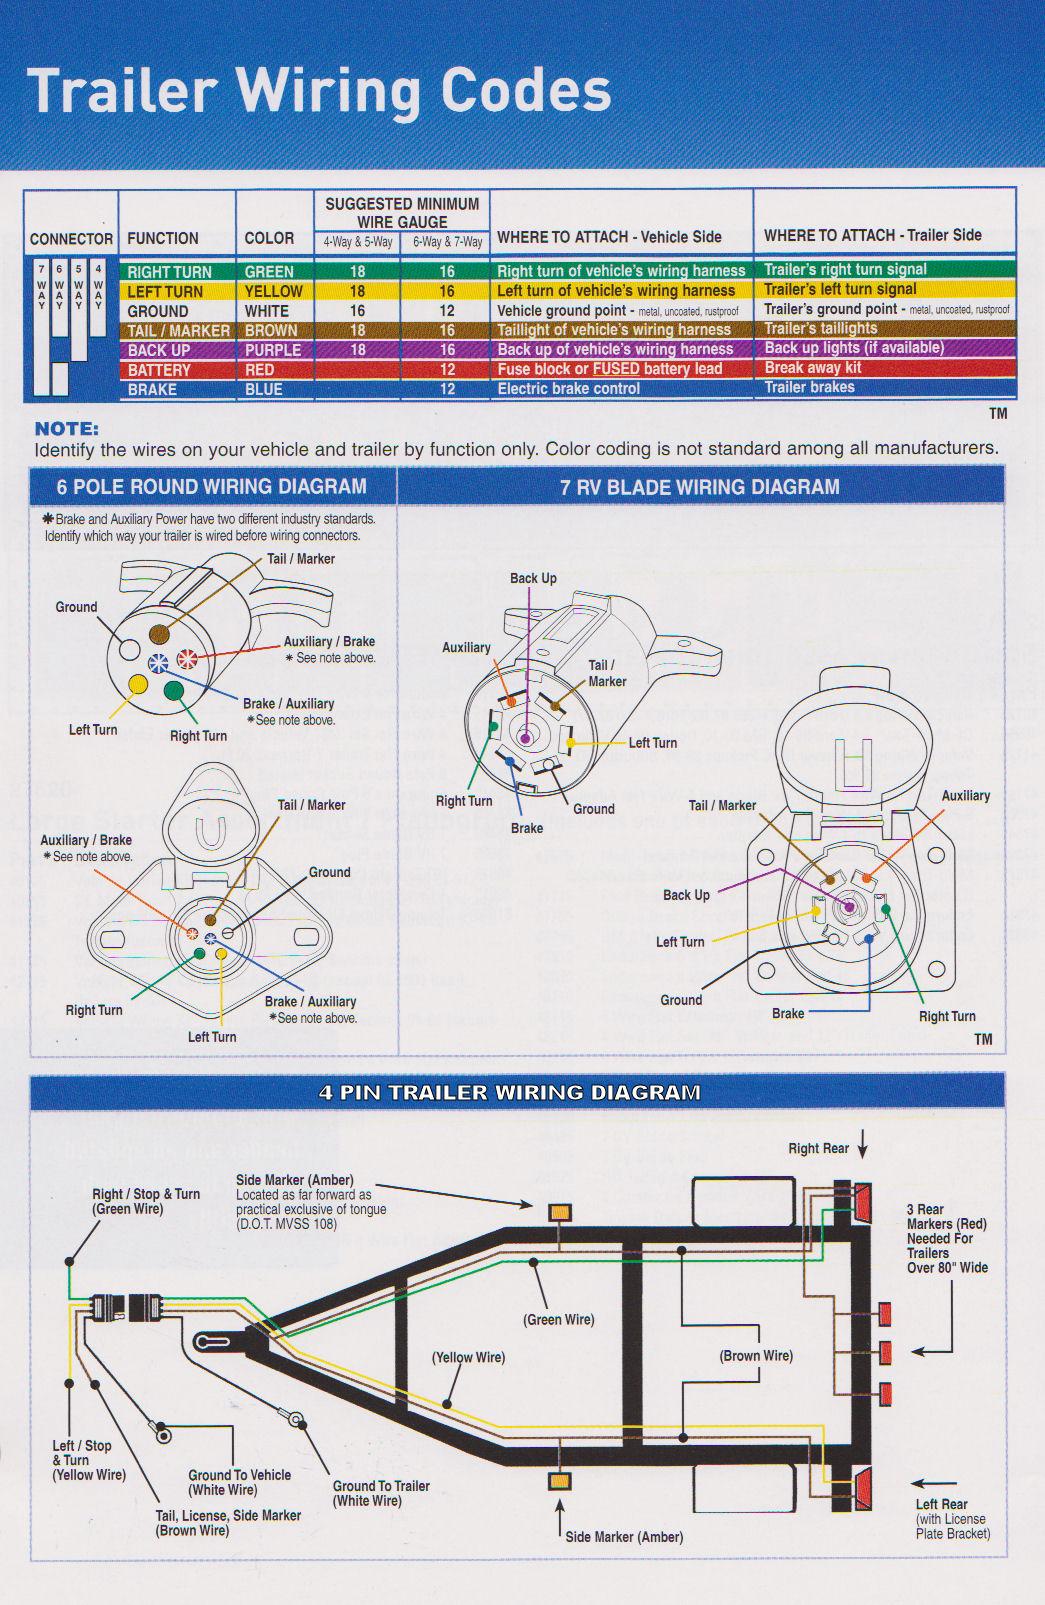 Flatbed Wiring Diagram Wiring Harness 68 Camaro Ss Bege Wiring Diagram